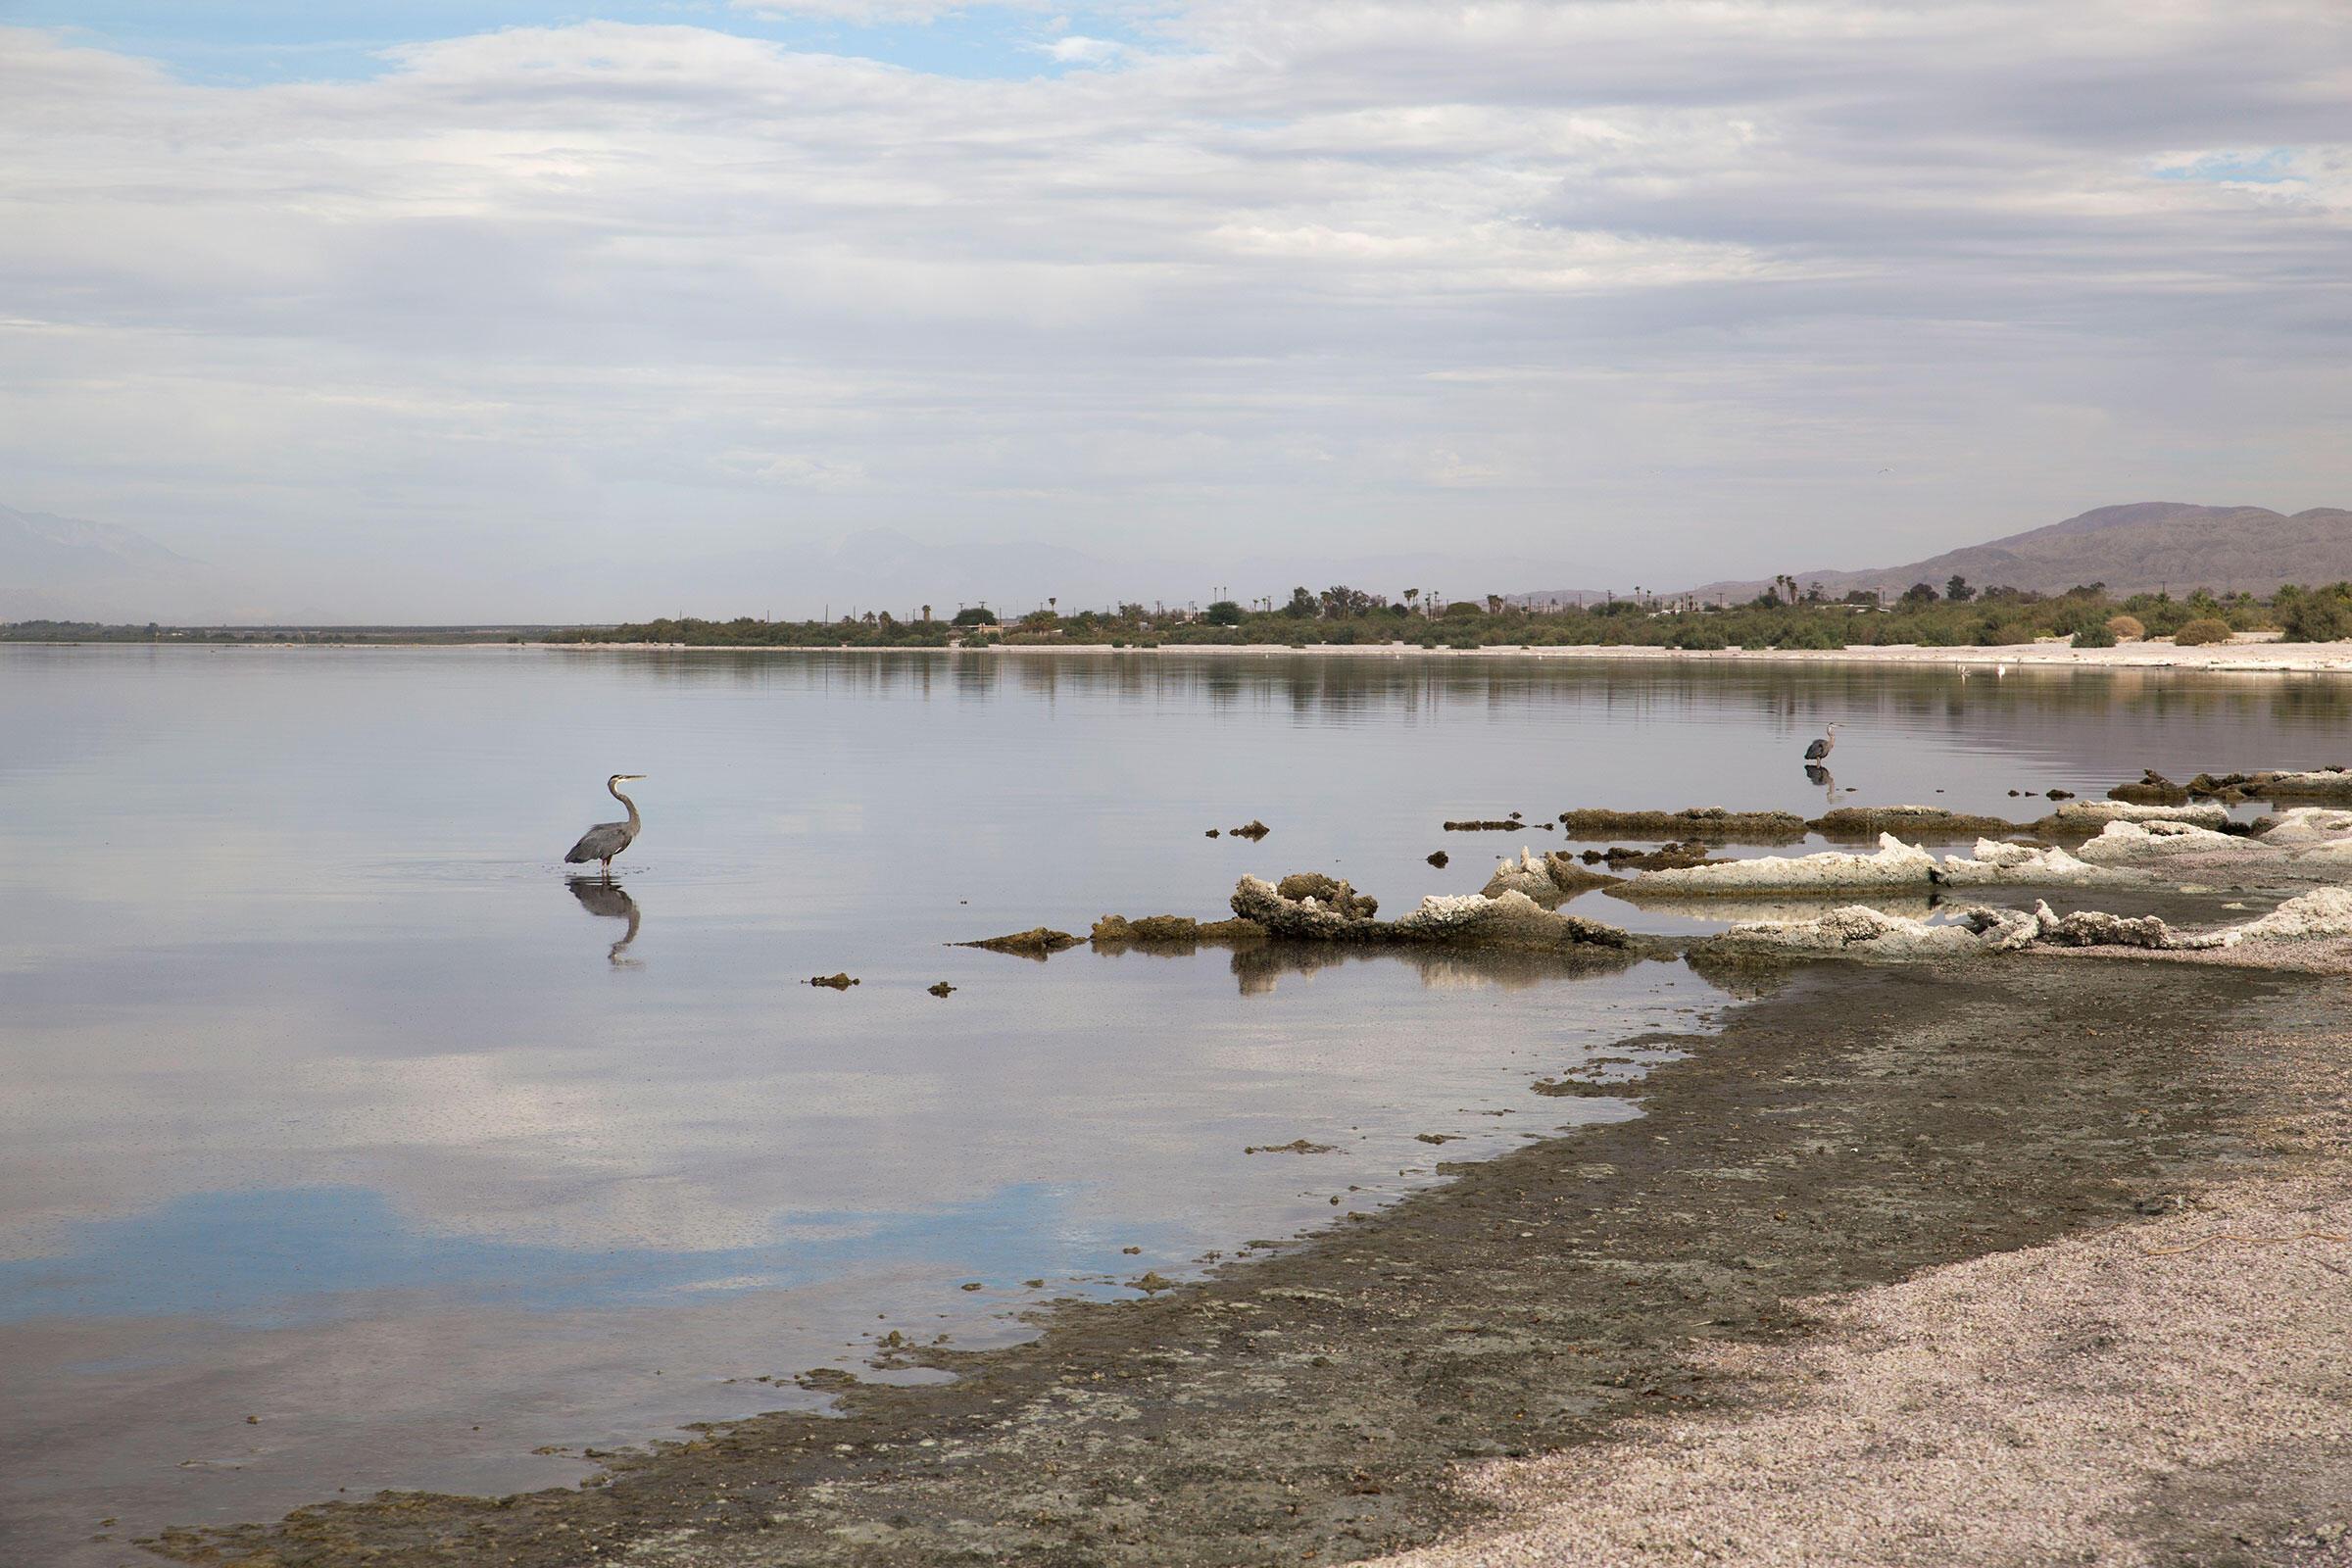 Great Blue Herons in the Salton Sea. Mike Fernandez/Audubon